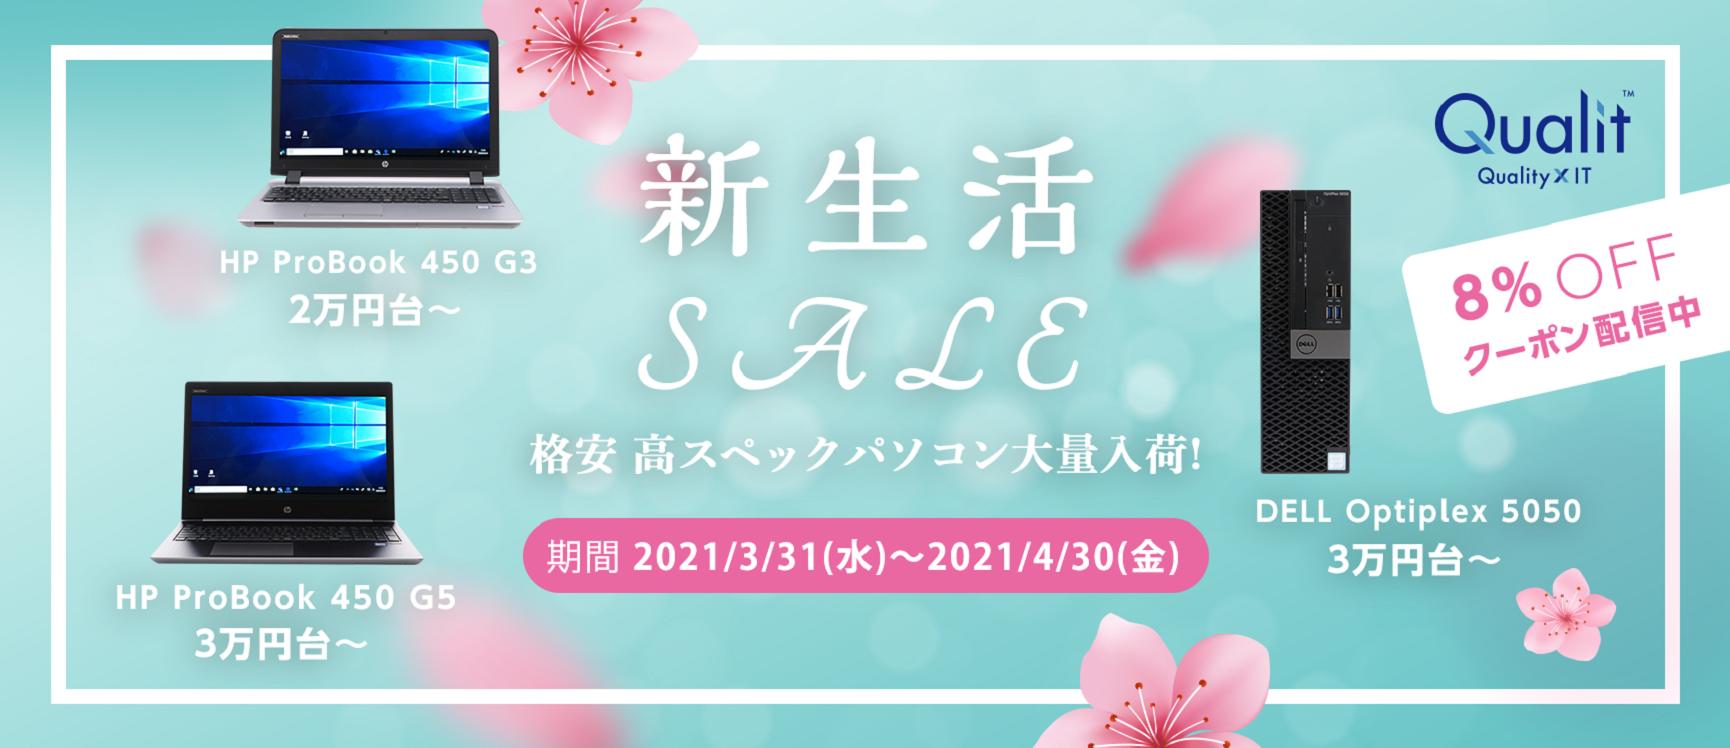 Qualit クオリット 新生活SALE 格安 高スペック パソコン 大量入荷!